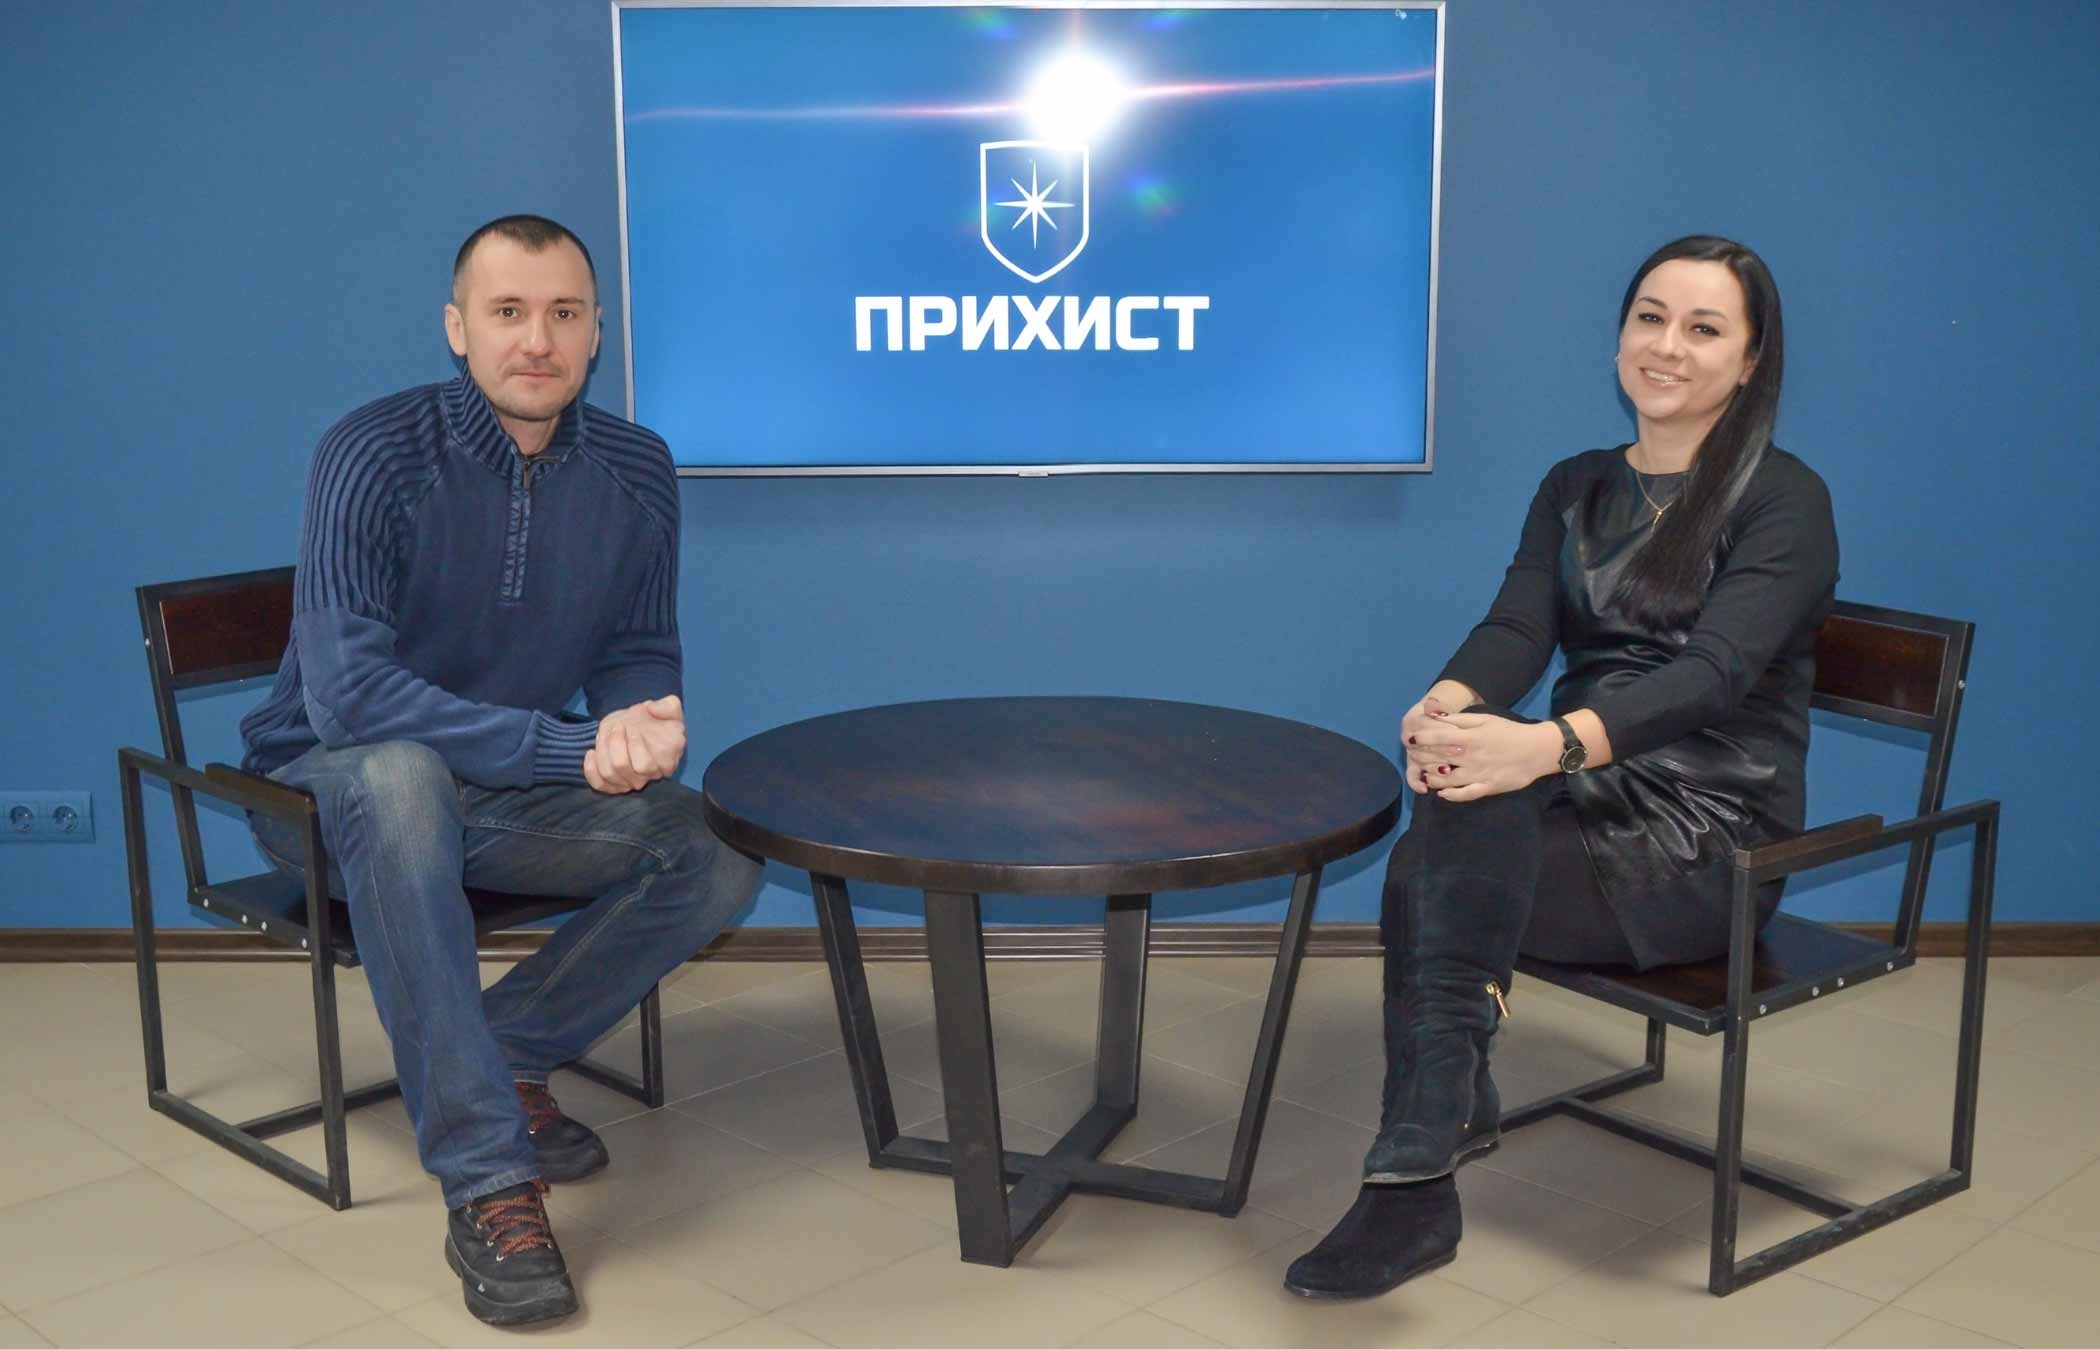 Интервью с Андреем Руденко: о конфликте с Никитченко, доме Поддубного, поддержке Олейника и команде Саюка | Прихист